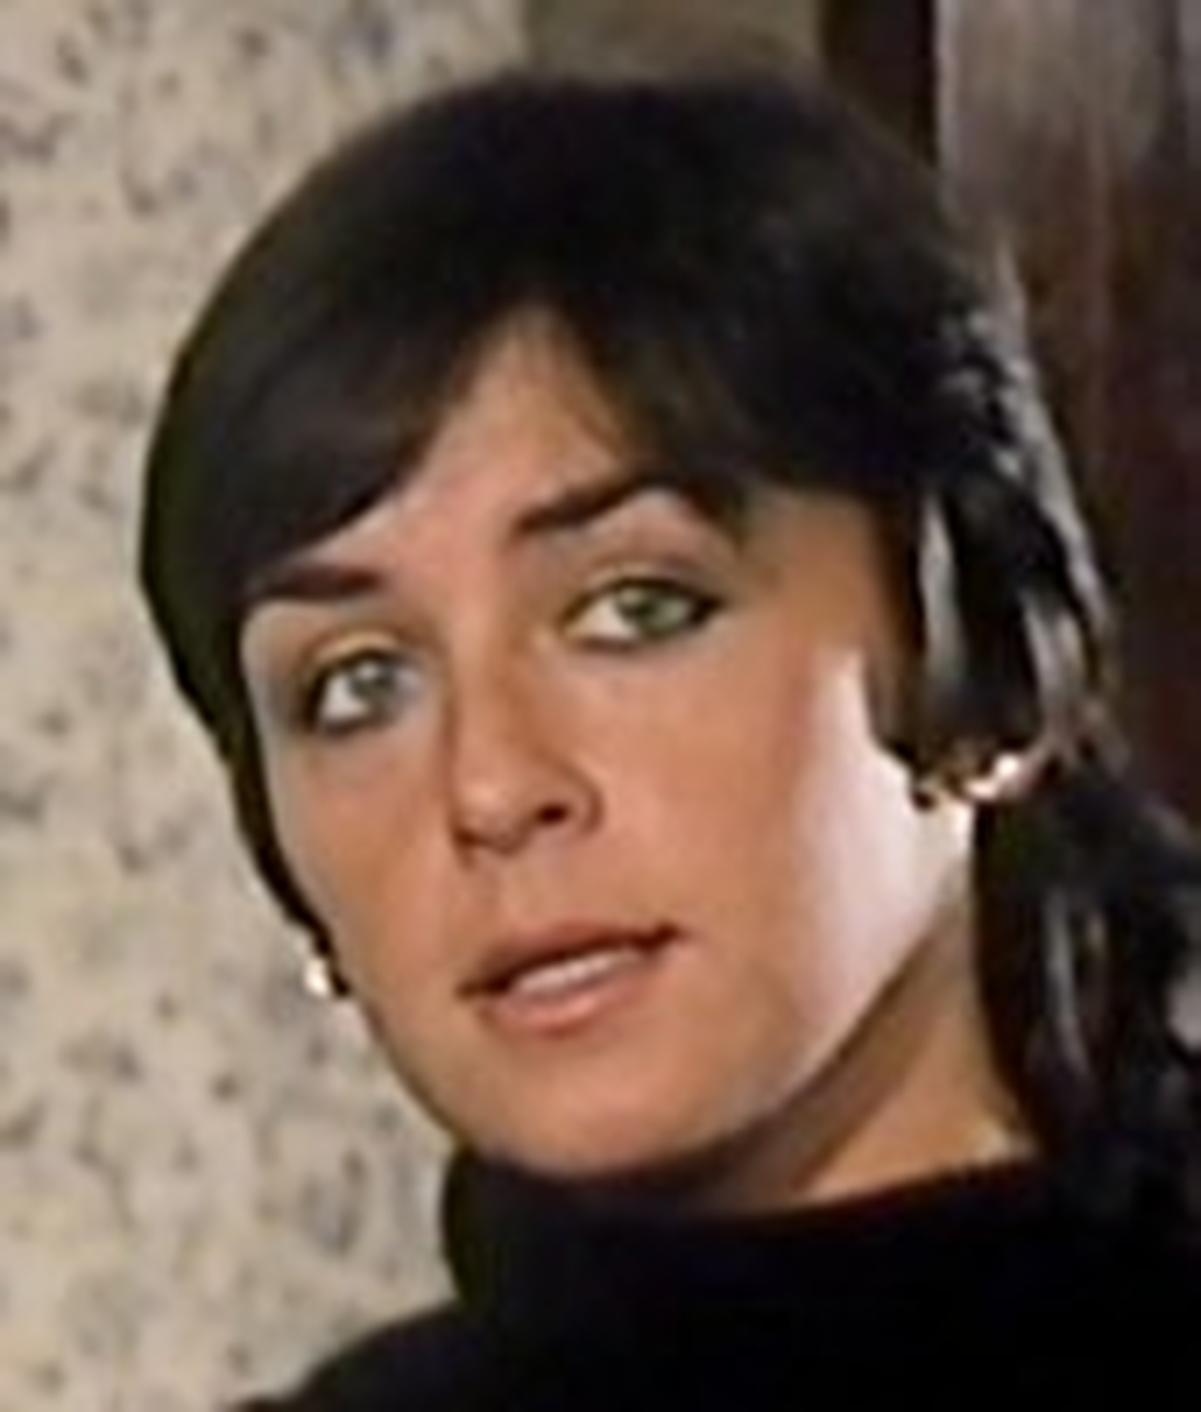 Cathy Menard